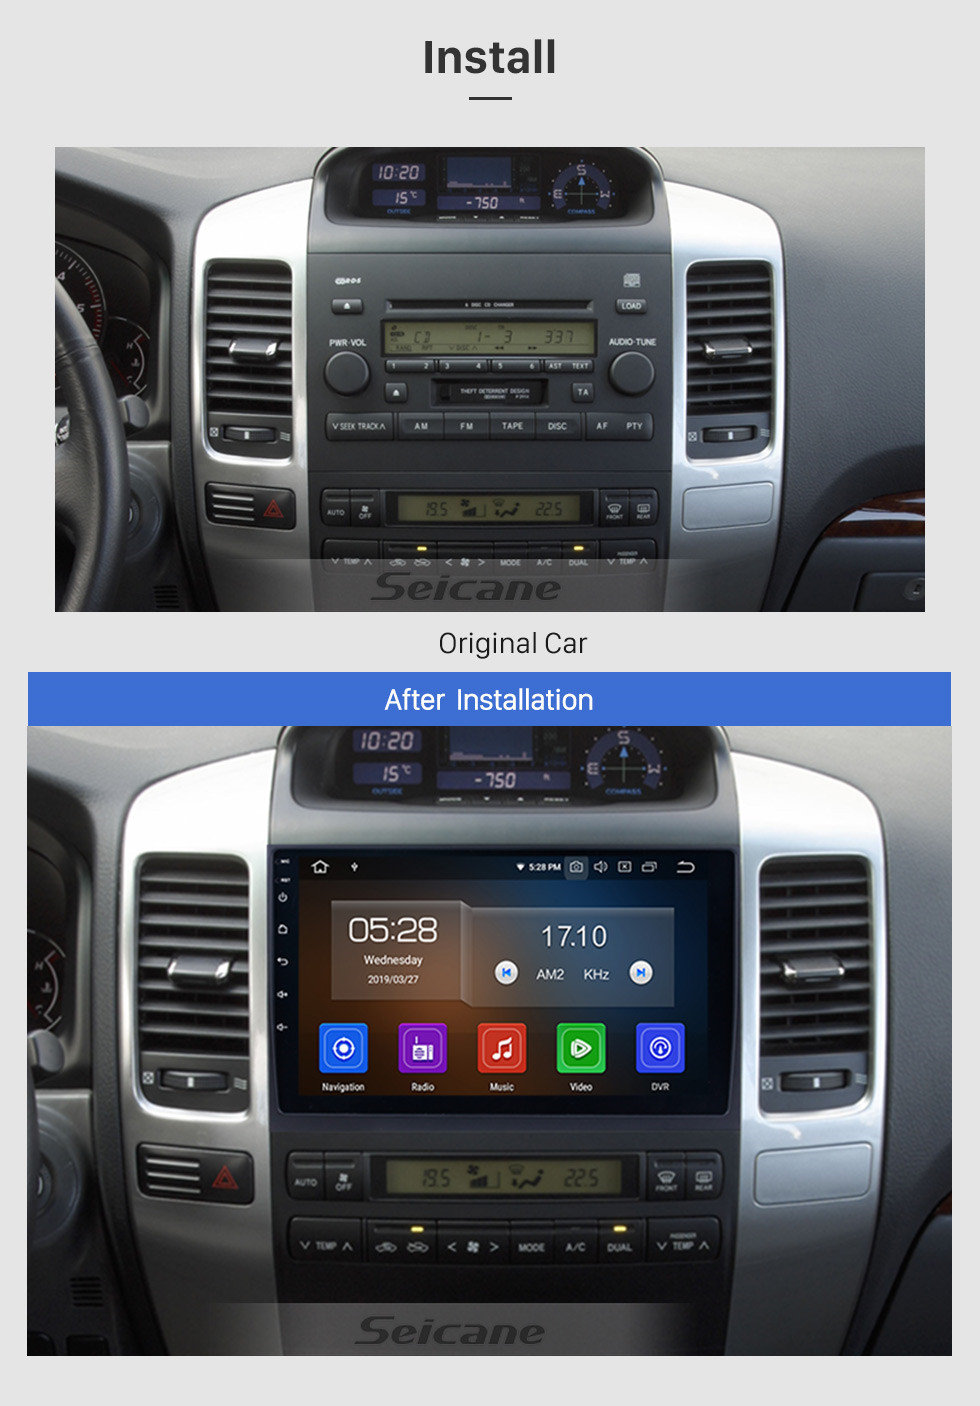 Seicane 9 inch HD Touch Screen 2002-2009 Toyota Prado Cruiser 120 Android 9.0 Radio GPS Navigation System Bluetooth Music 4G WiFi Backup Camera Mirror Link OBD2 Steering Wheel Control